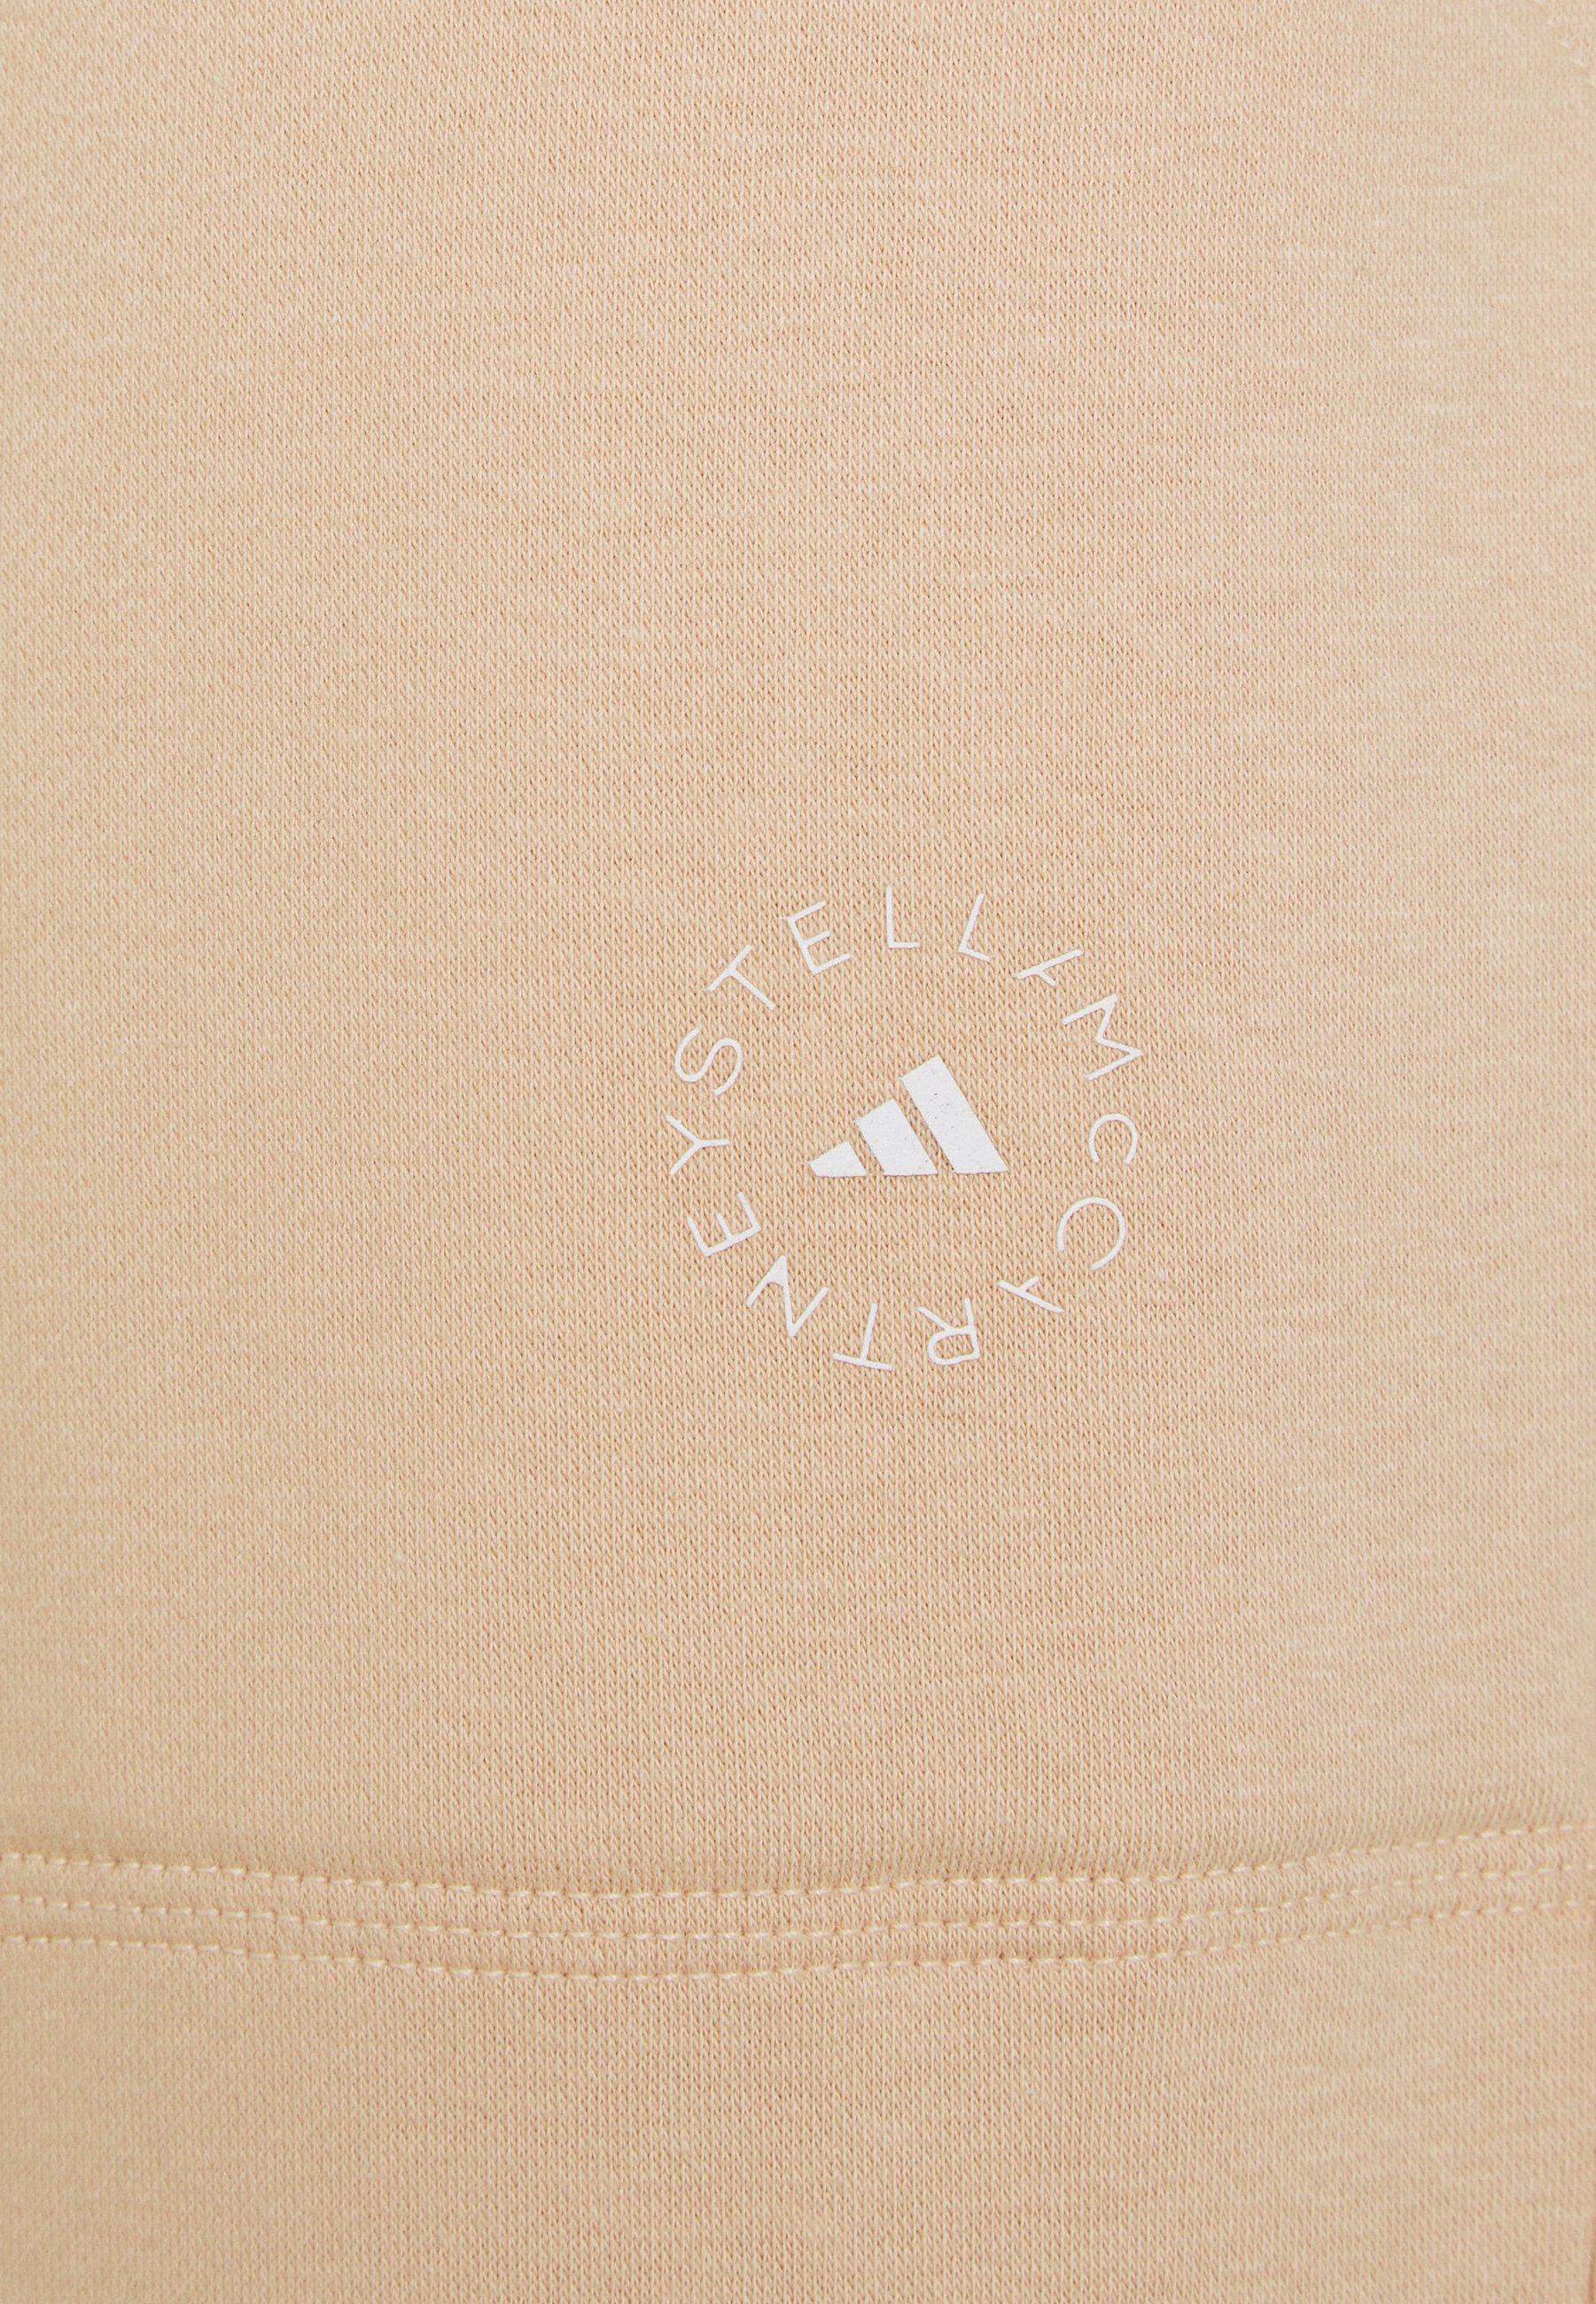 adidas by Stella McCartney Tracksuit bottoms - soft powder/light brown wI5hx